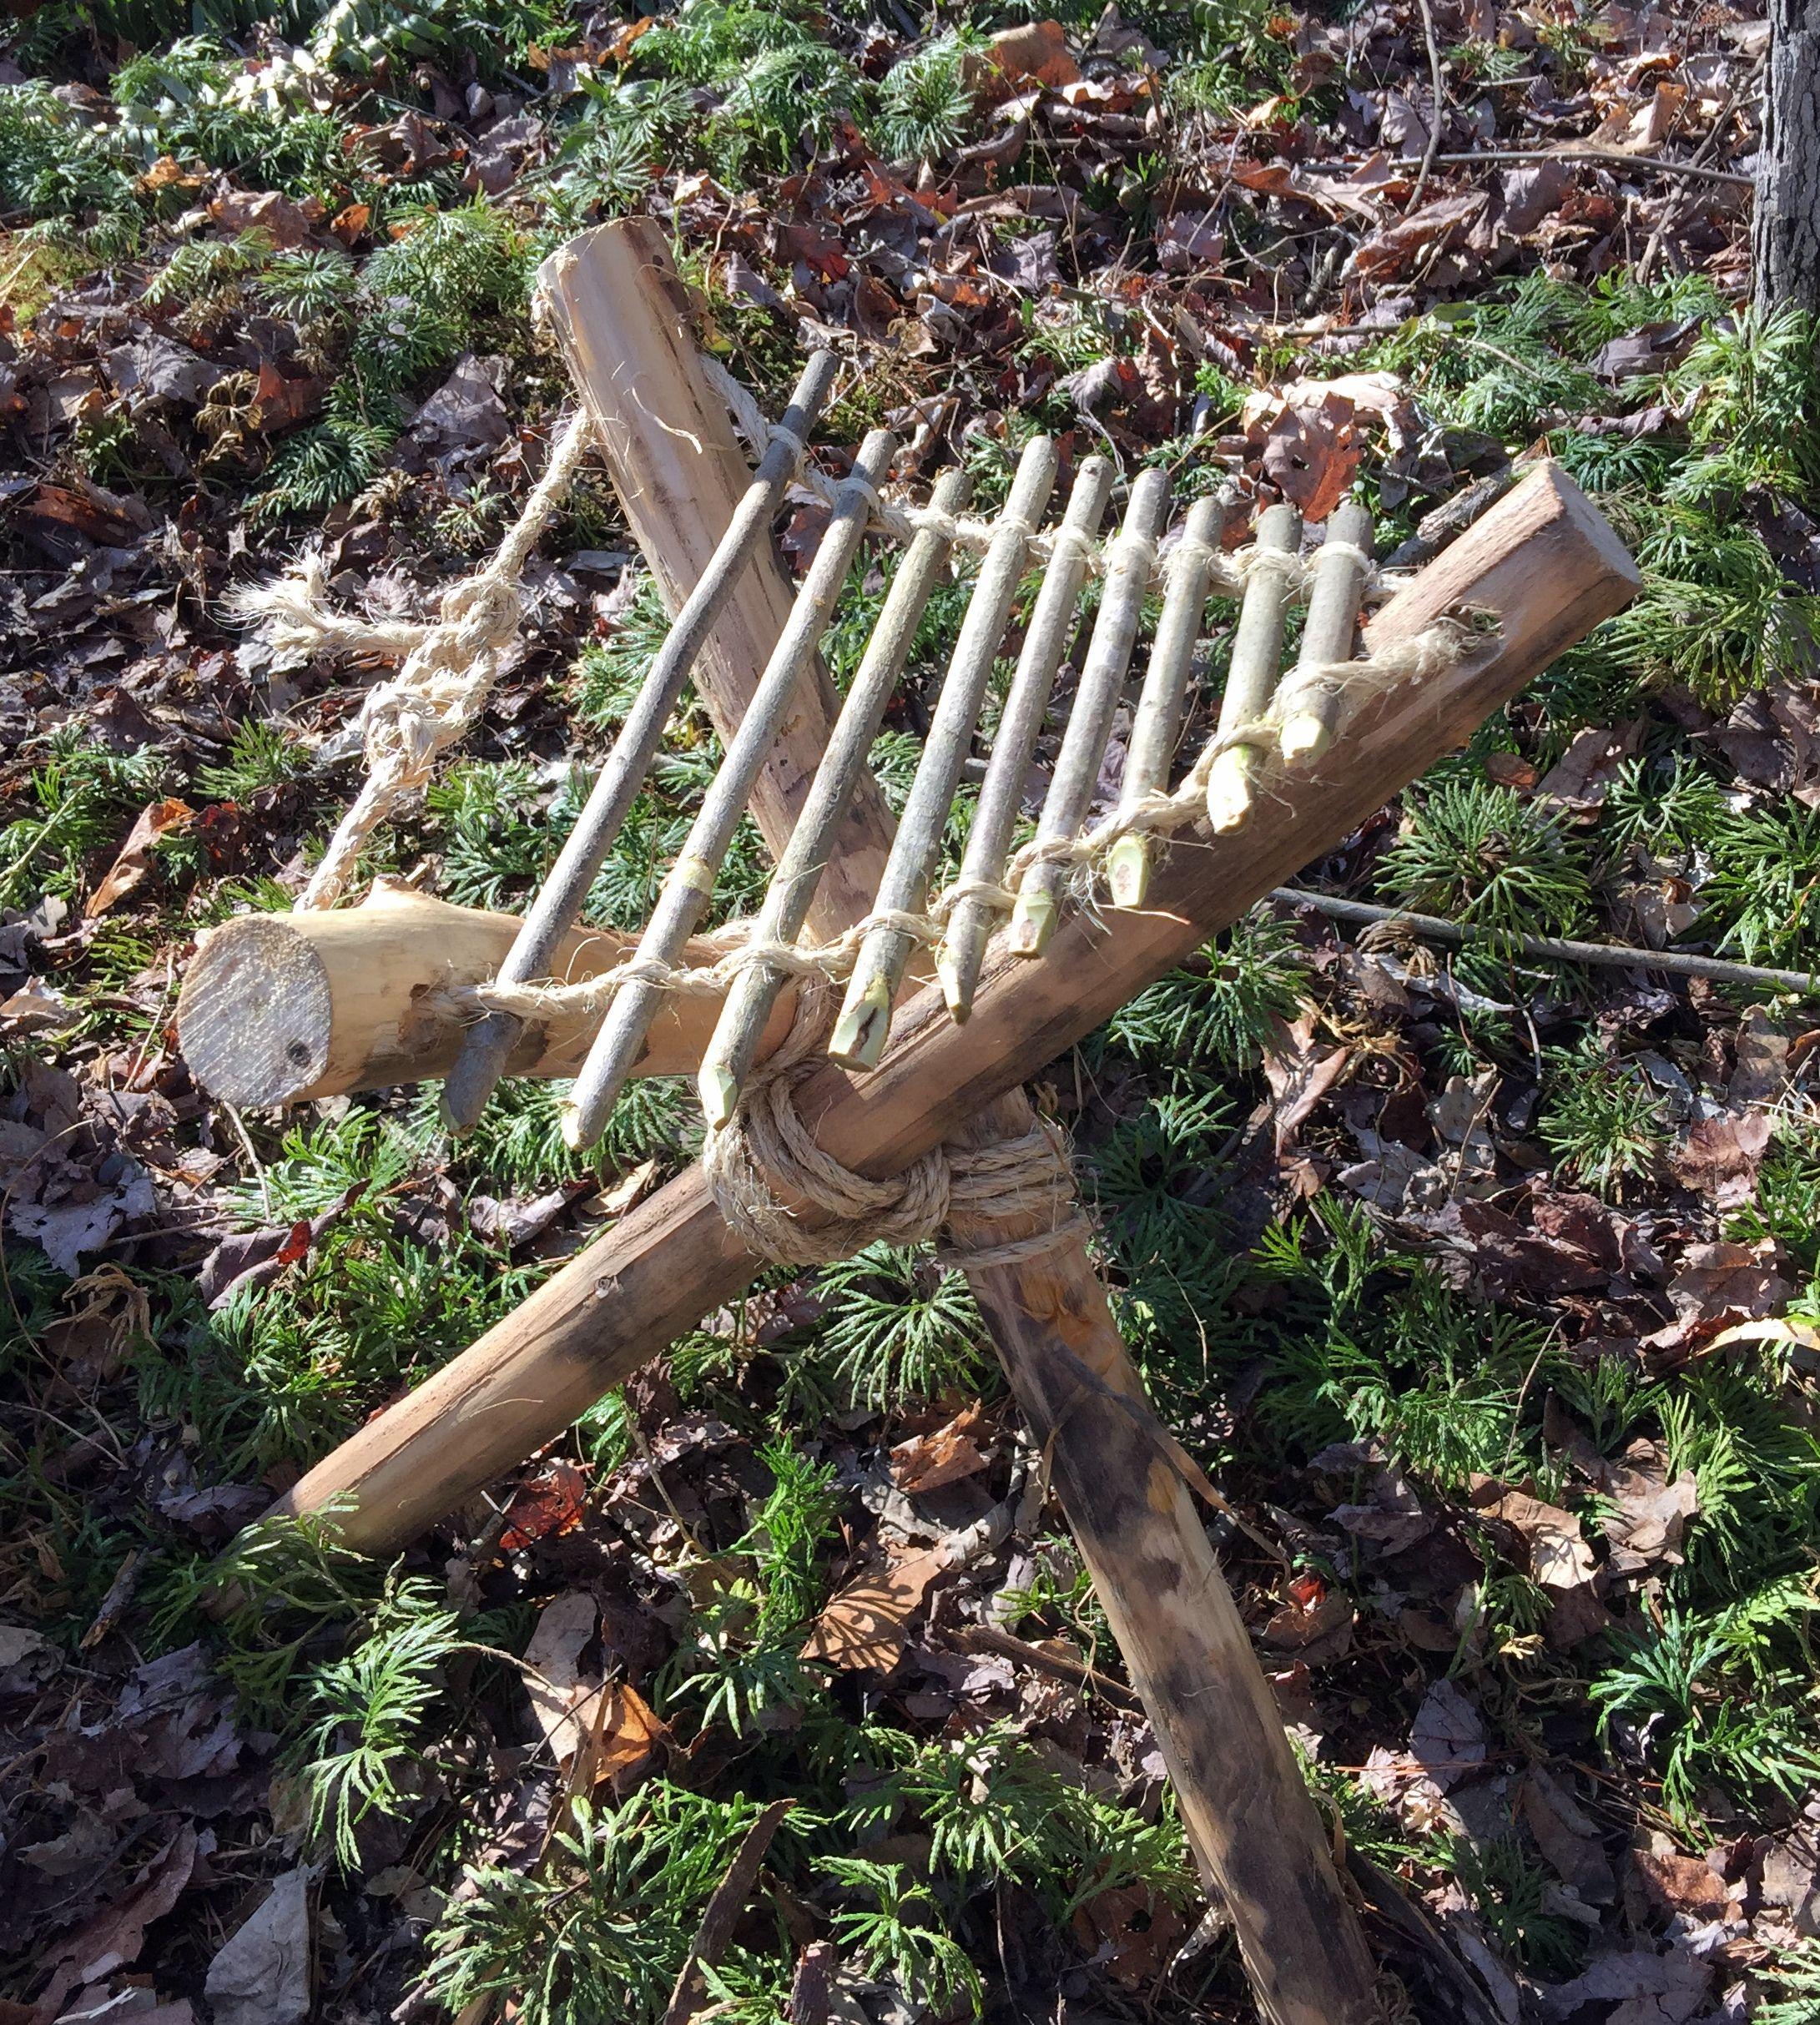 Bushcraft Survival Skills: Tripod With Stick Seat